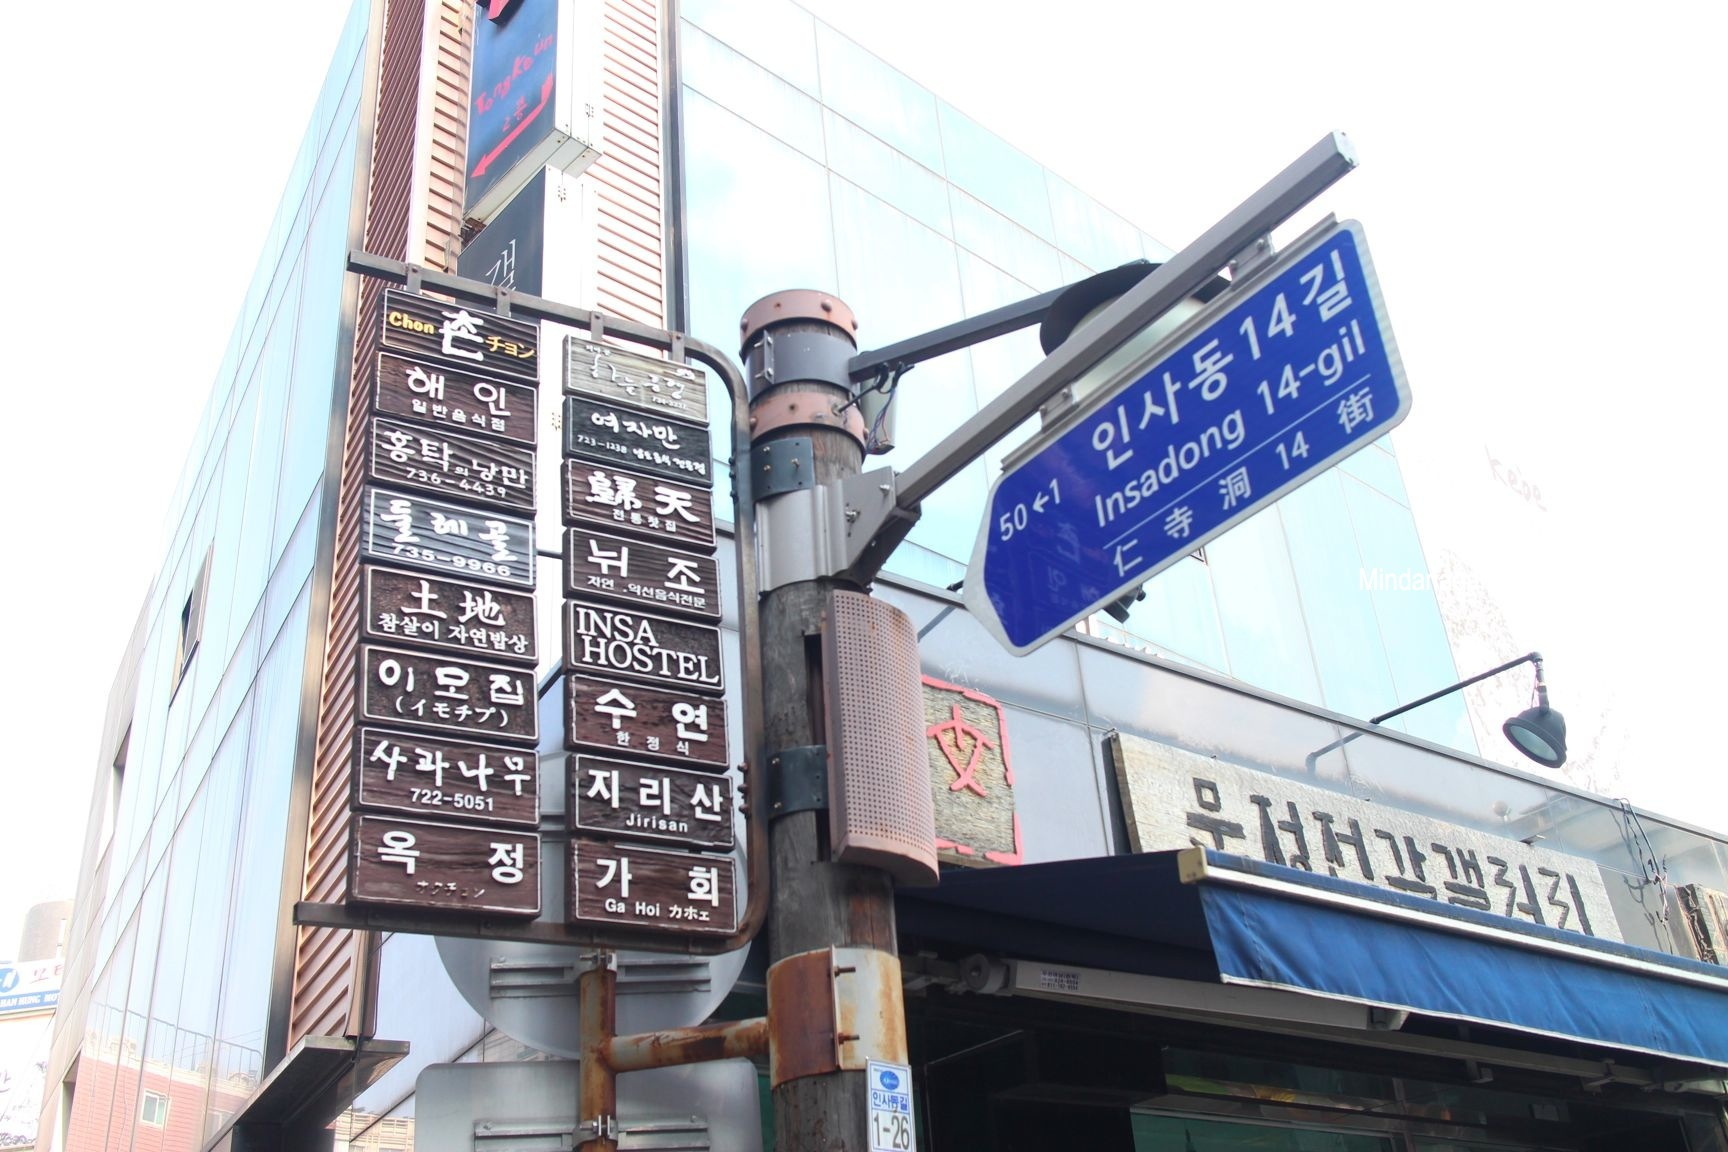 Mindanaoan In Korea Travel Series: Insadong Seoul